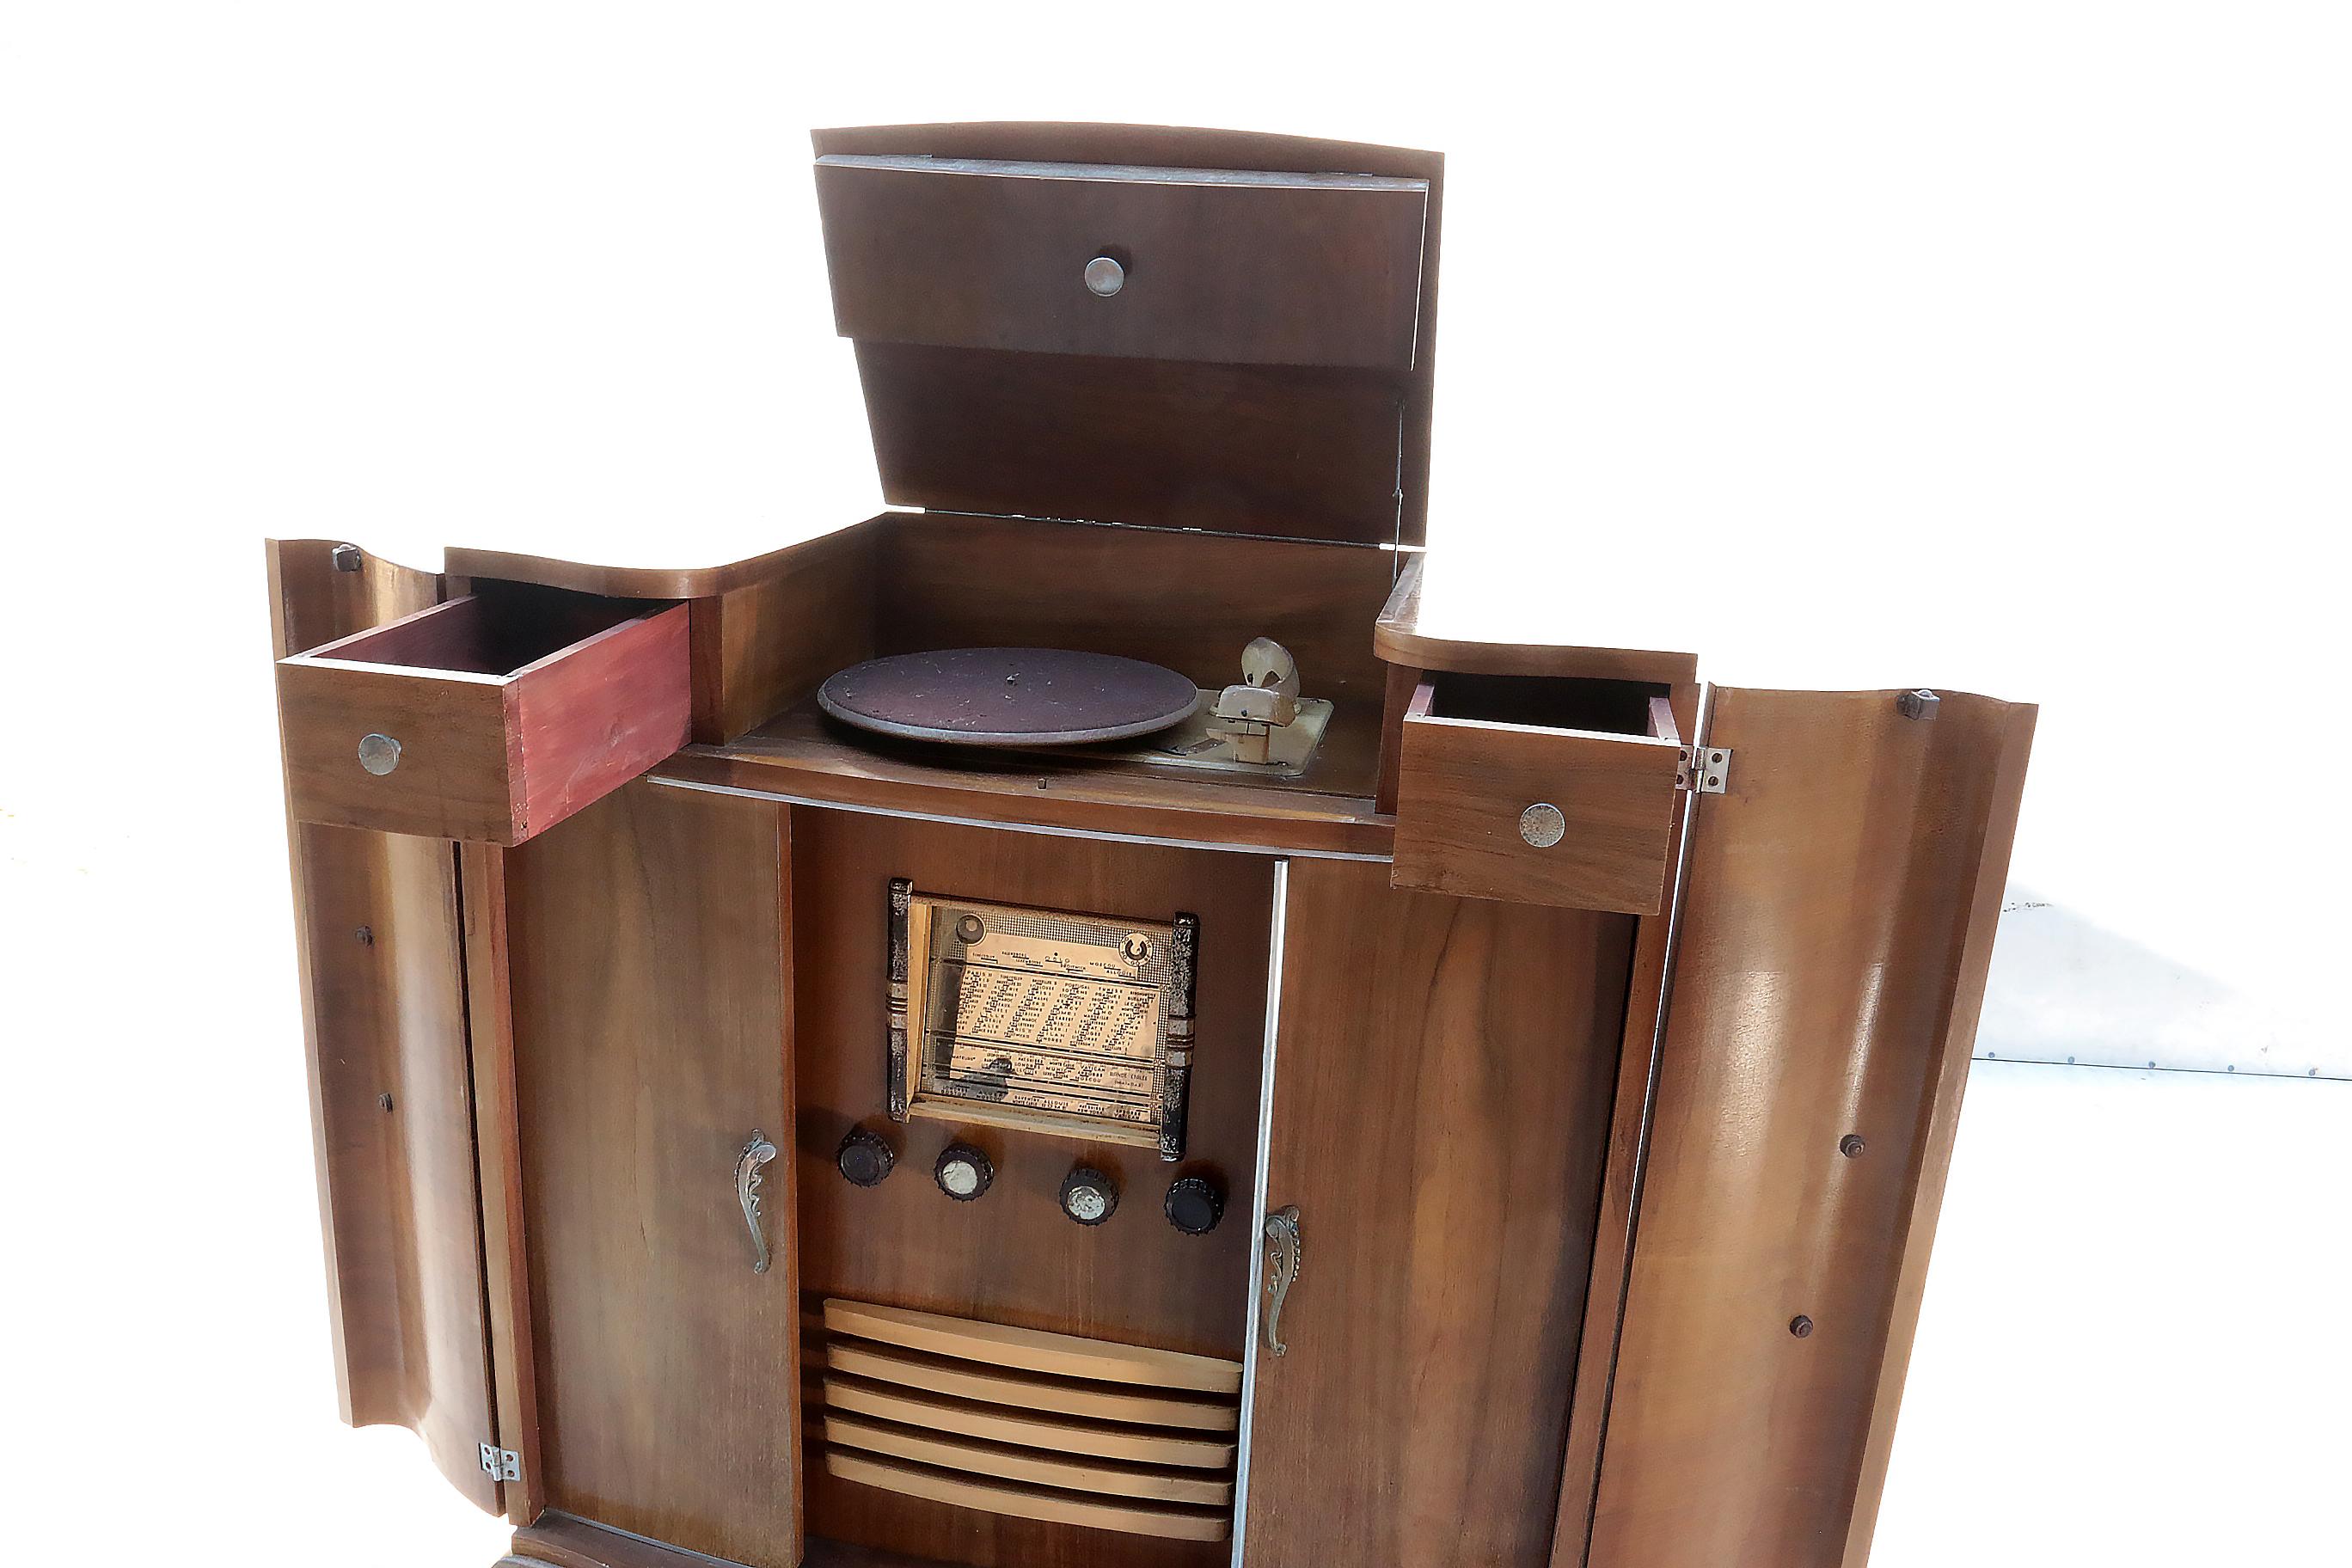 Radio Meubel Jaren 60.Art Deco Design Radio Pick Up Meubel Jaren 30 Museumstuk